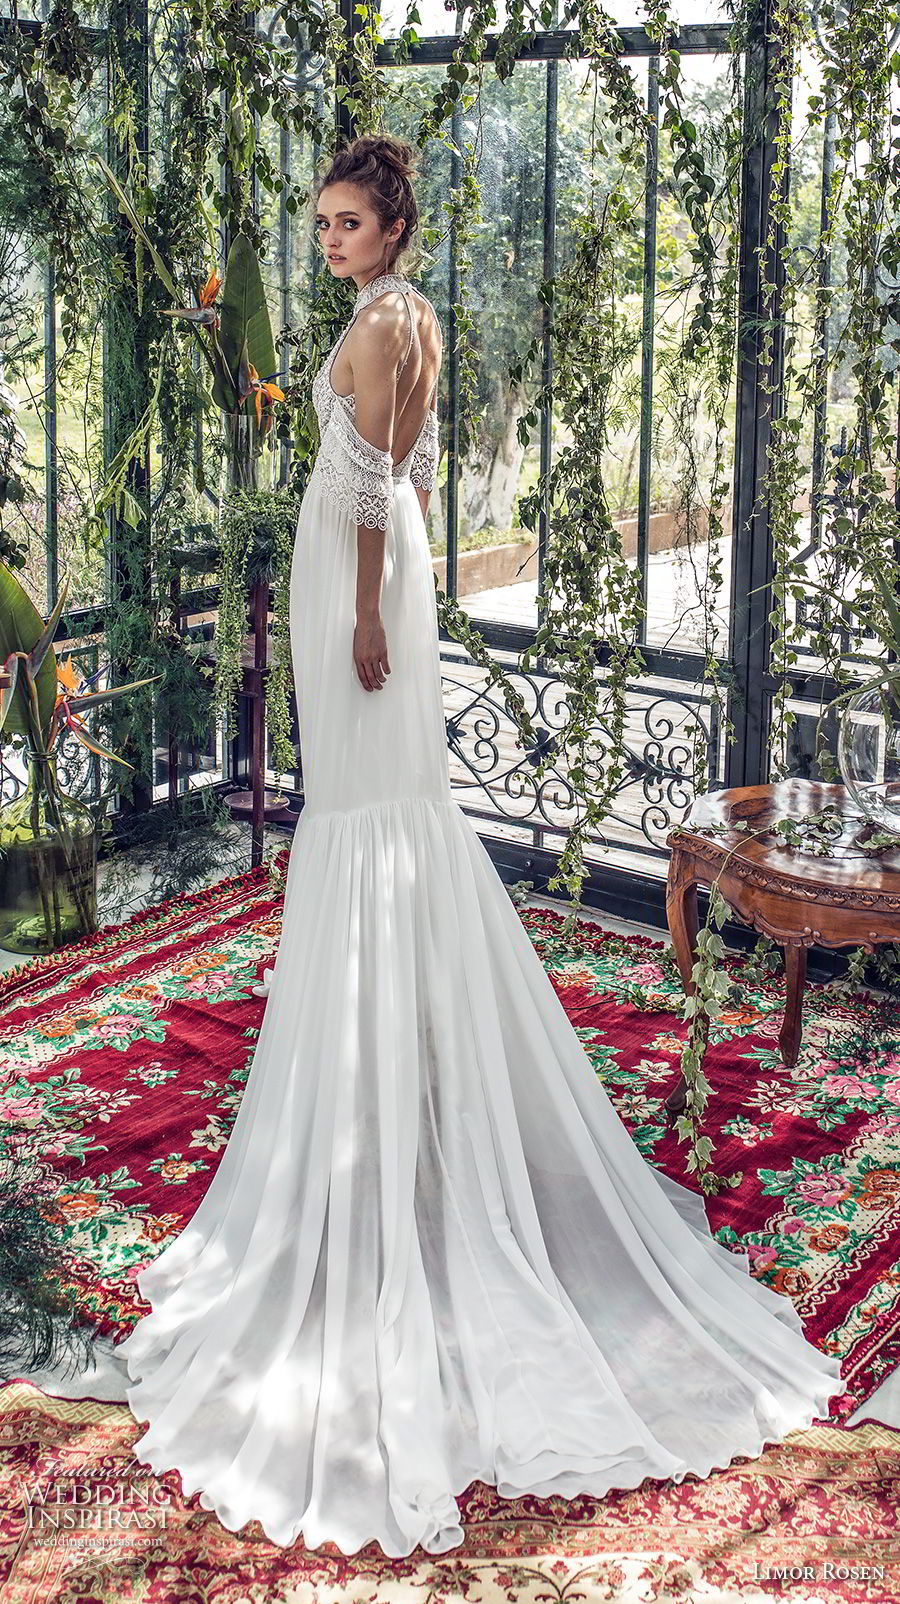 limor rosen 2019 xo bridal cold soulder halter jewel neck heavily embellished bodice romantic soft a  line wedding dress open back medium train (10) bv